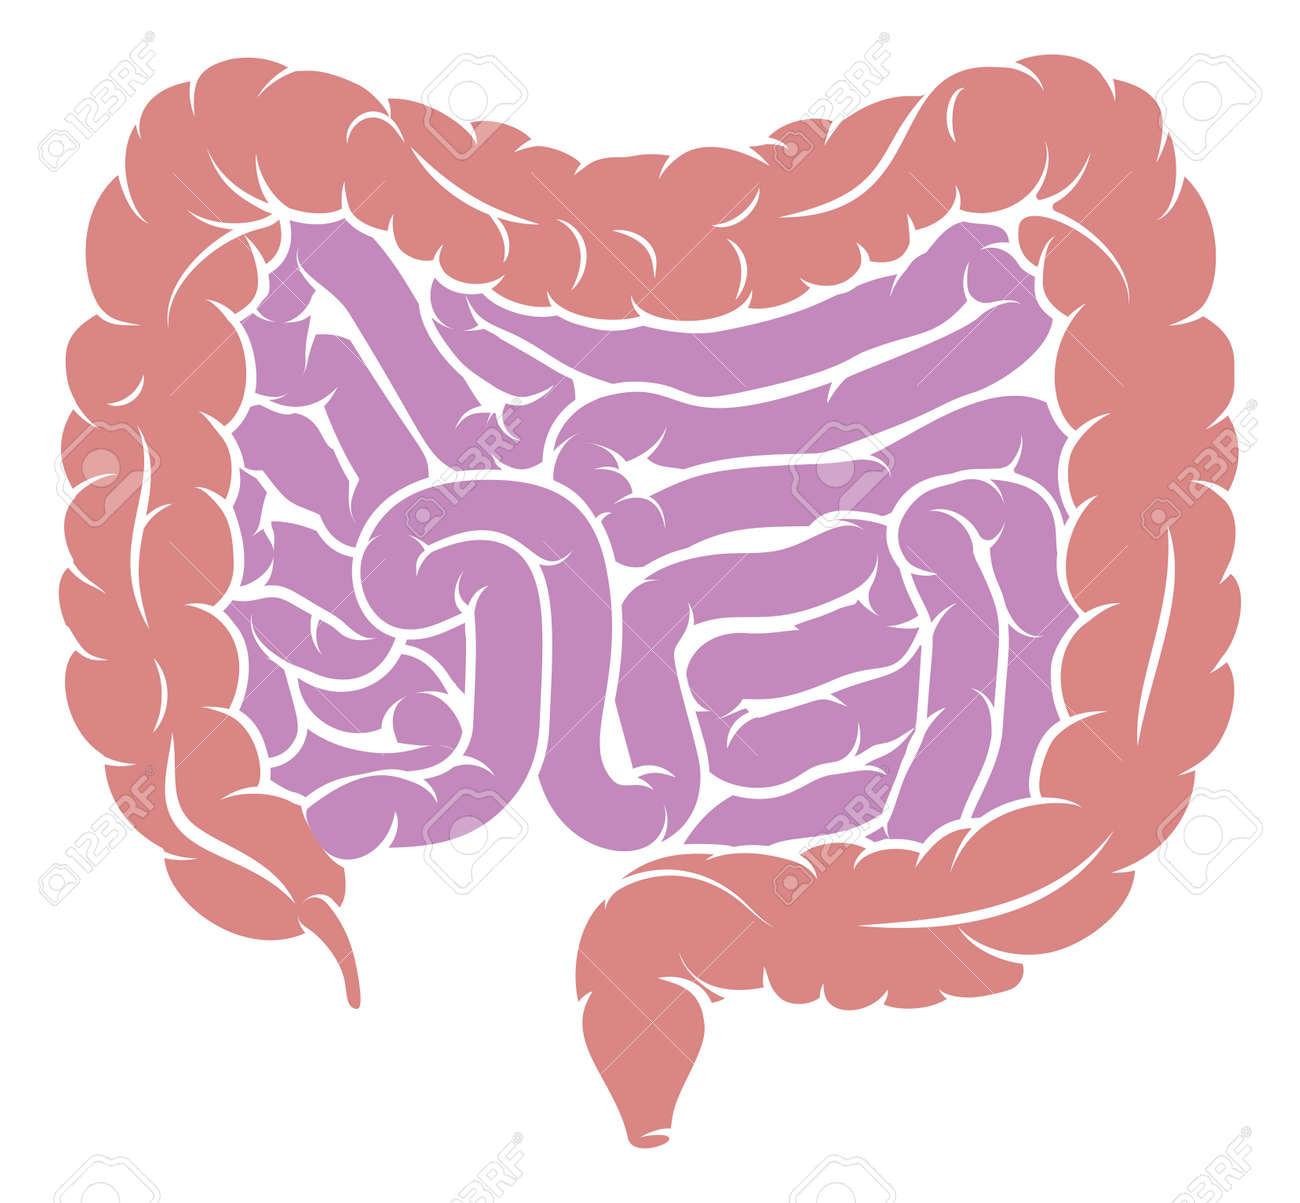 Human digestive system intestines diagram. - 93008093